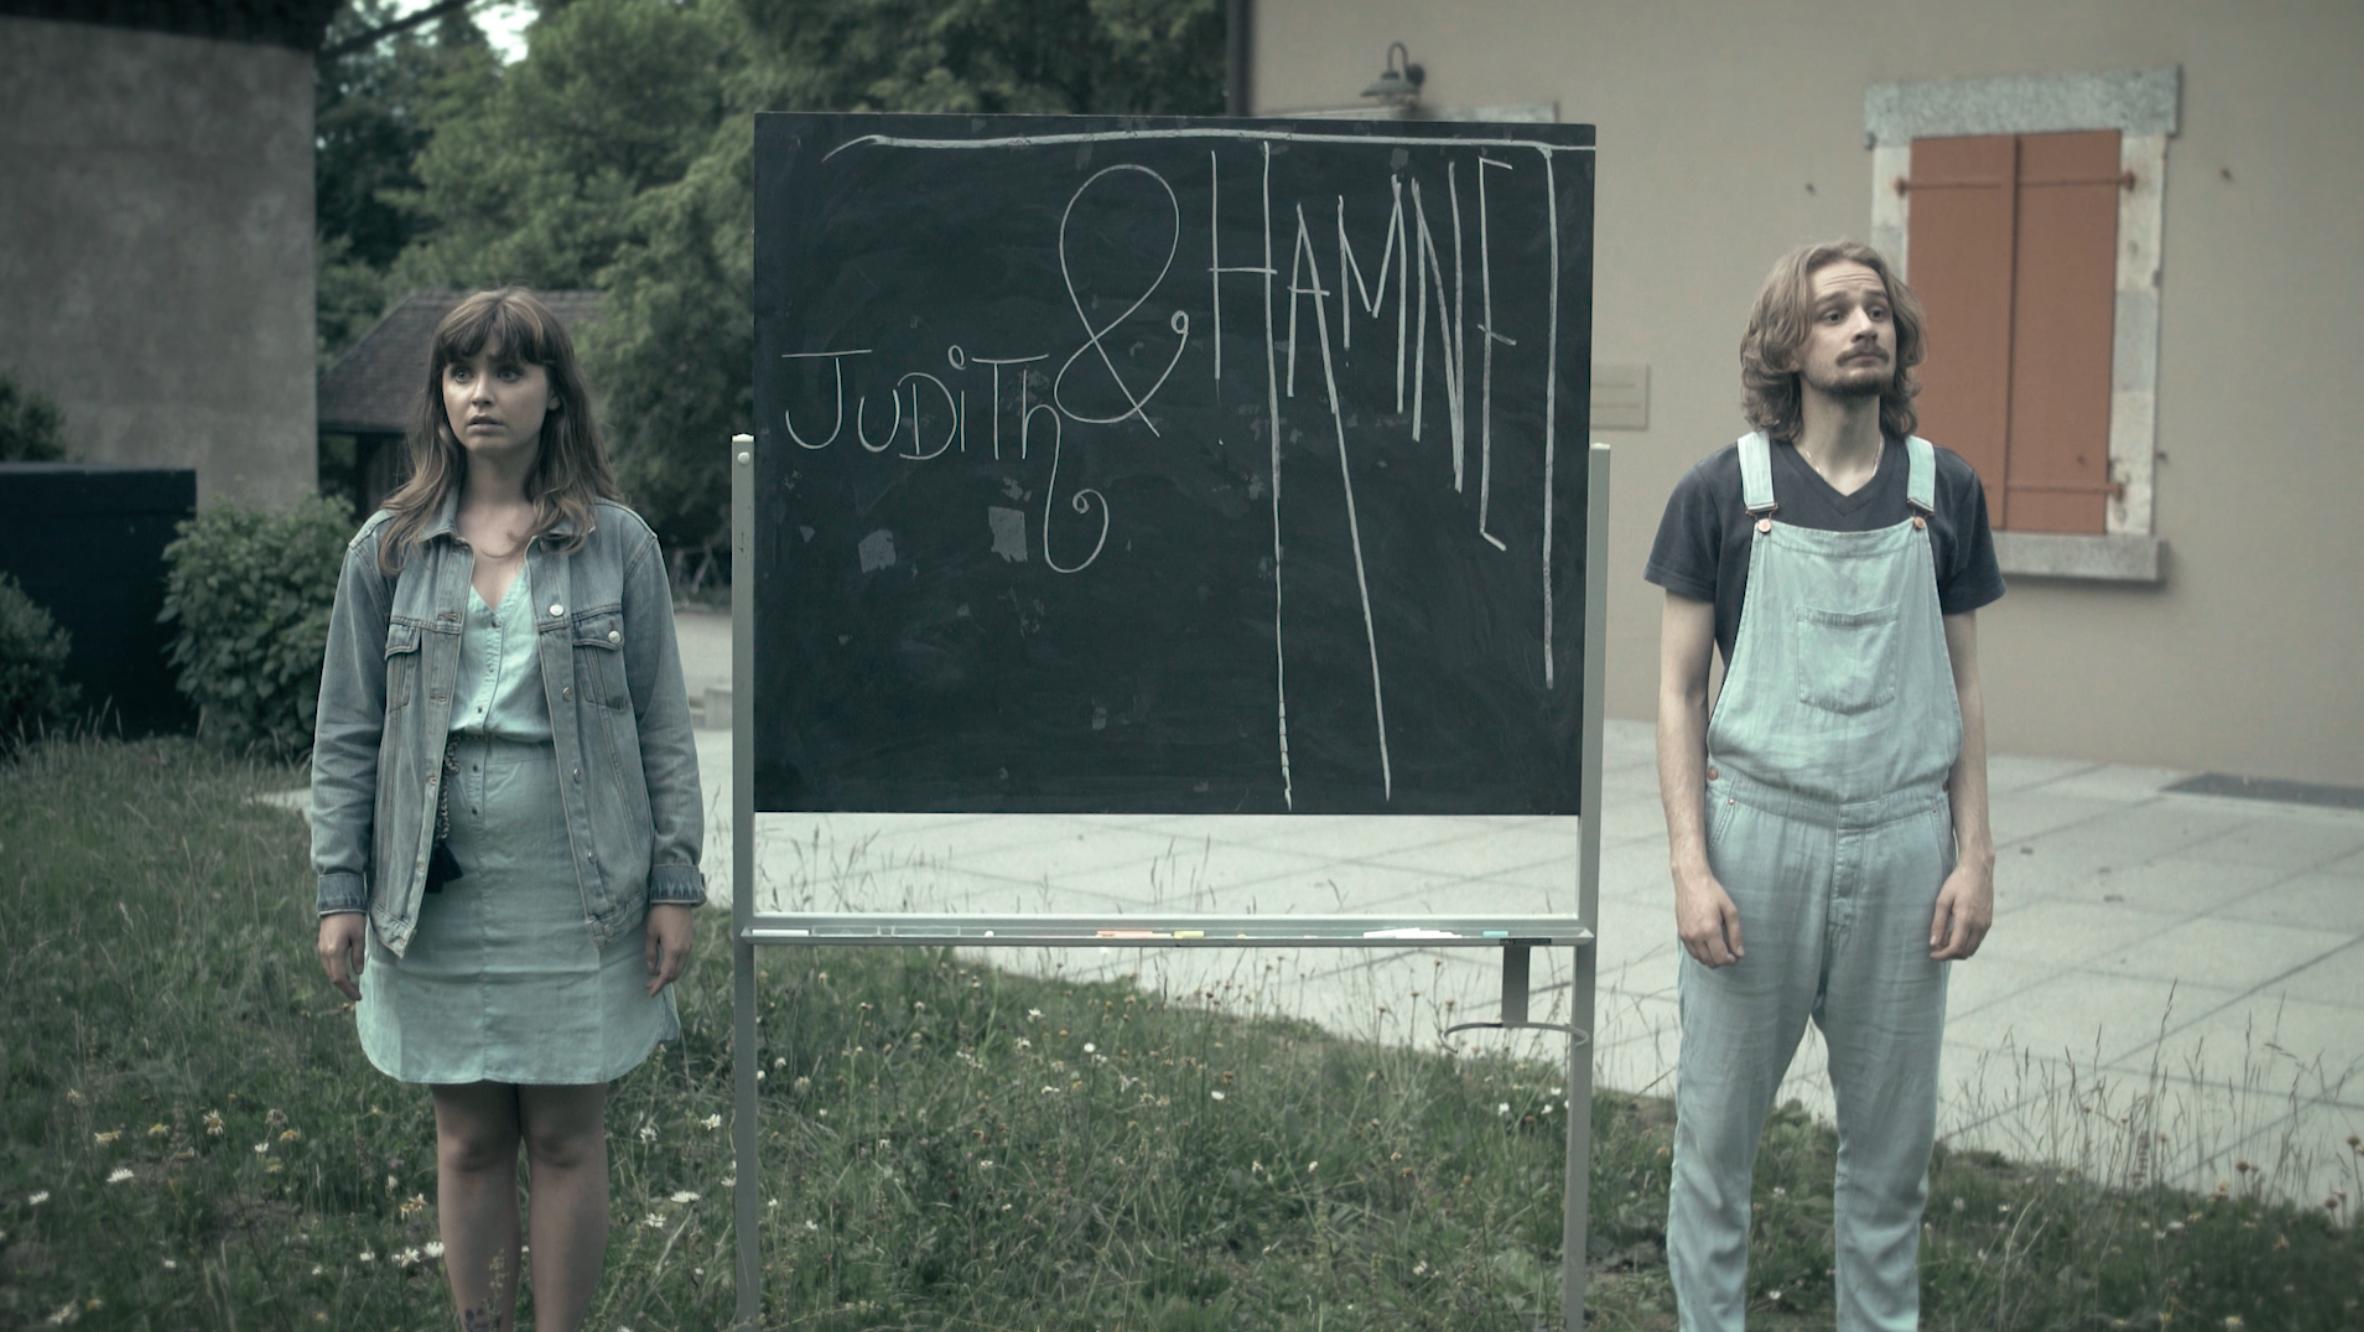 Judith and Hamnet